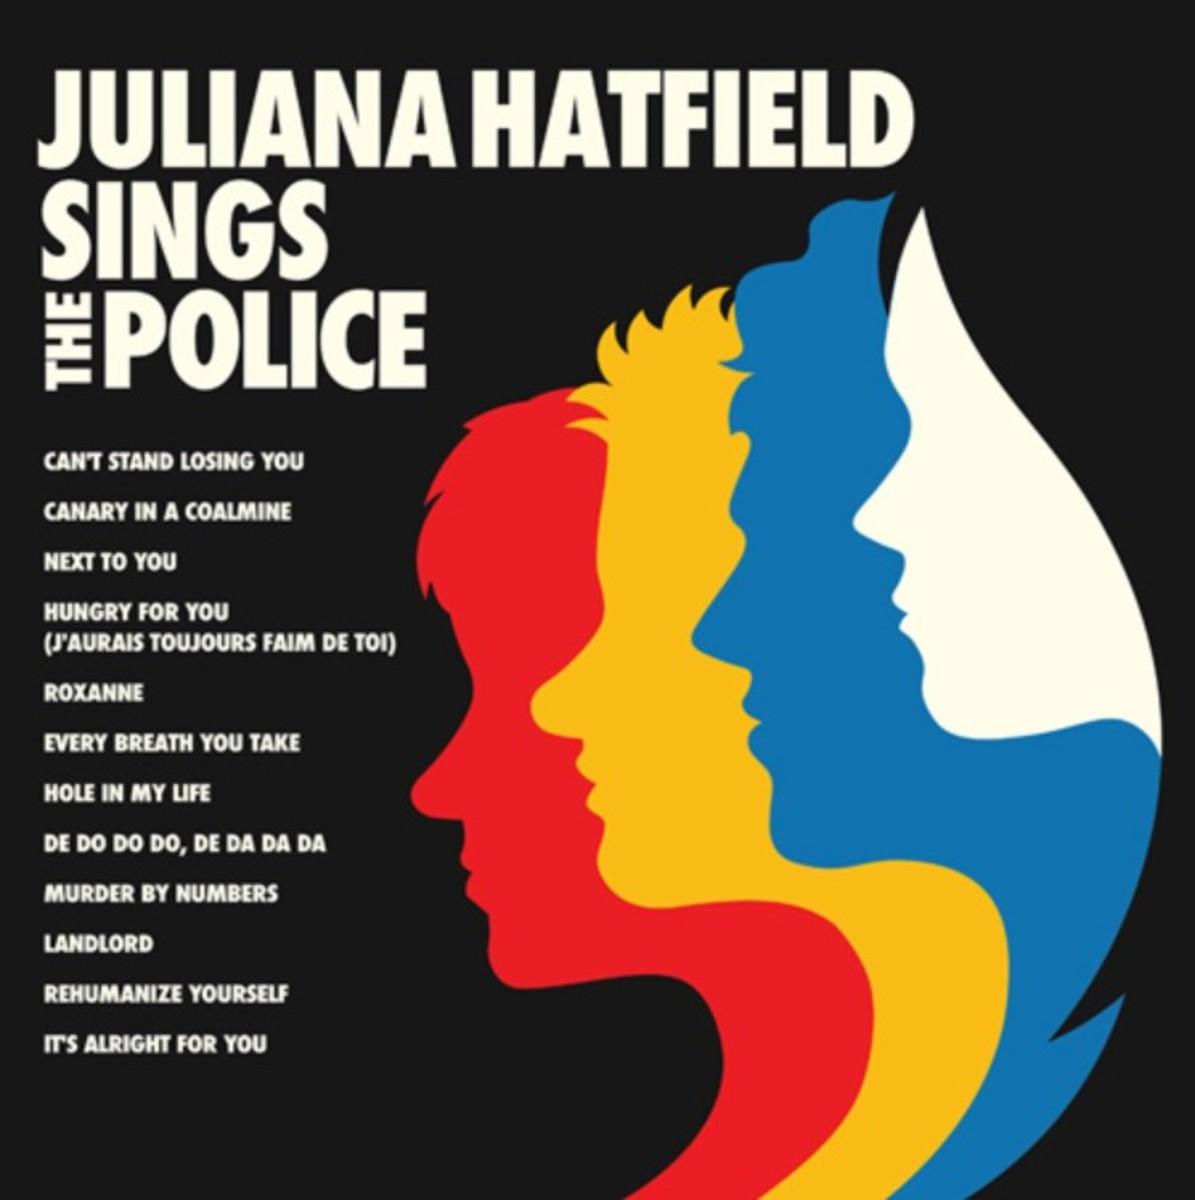 Juliana Hatfield Police